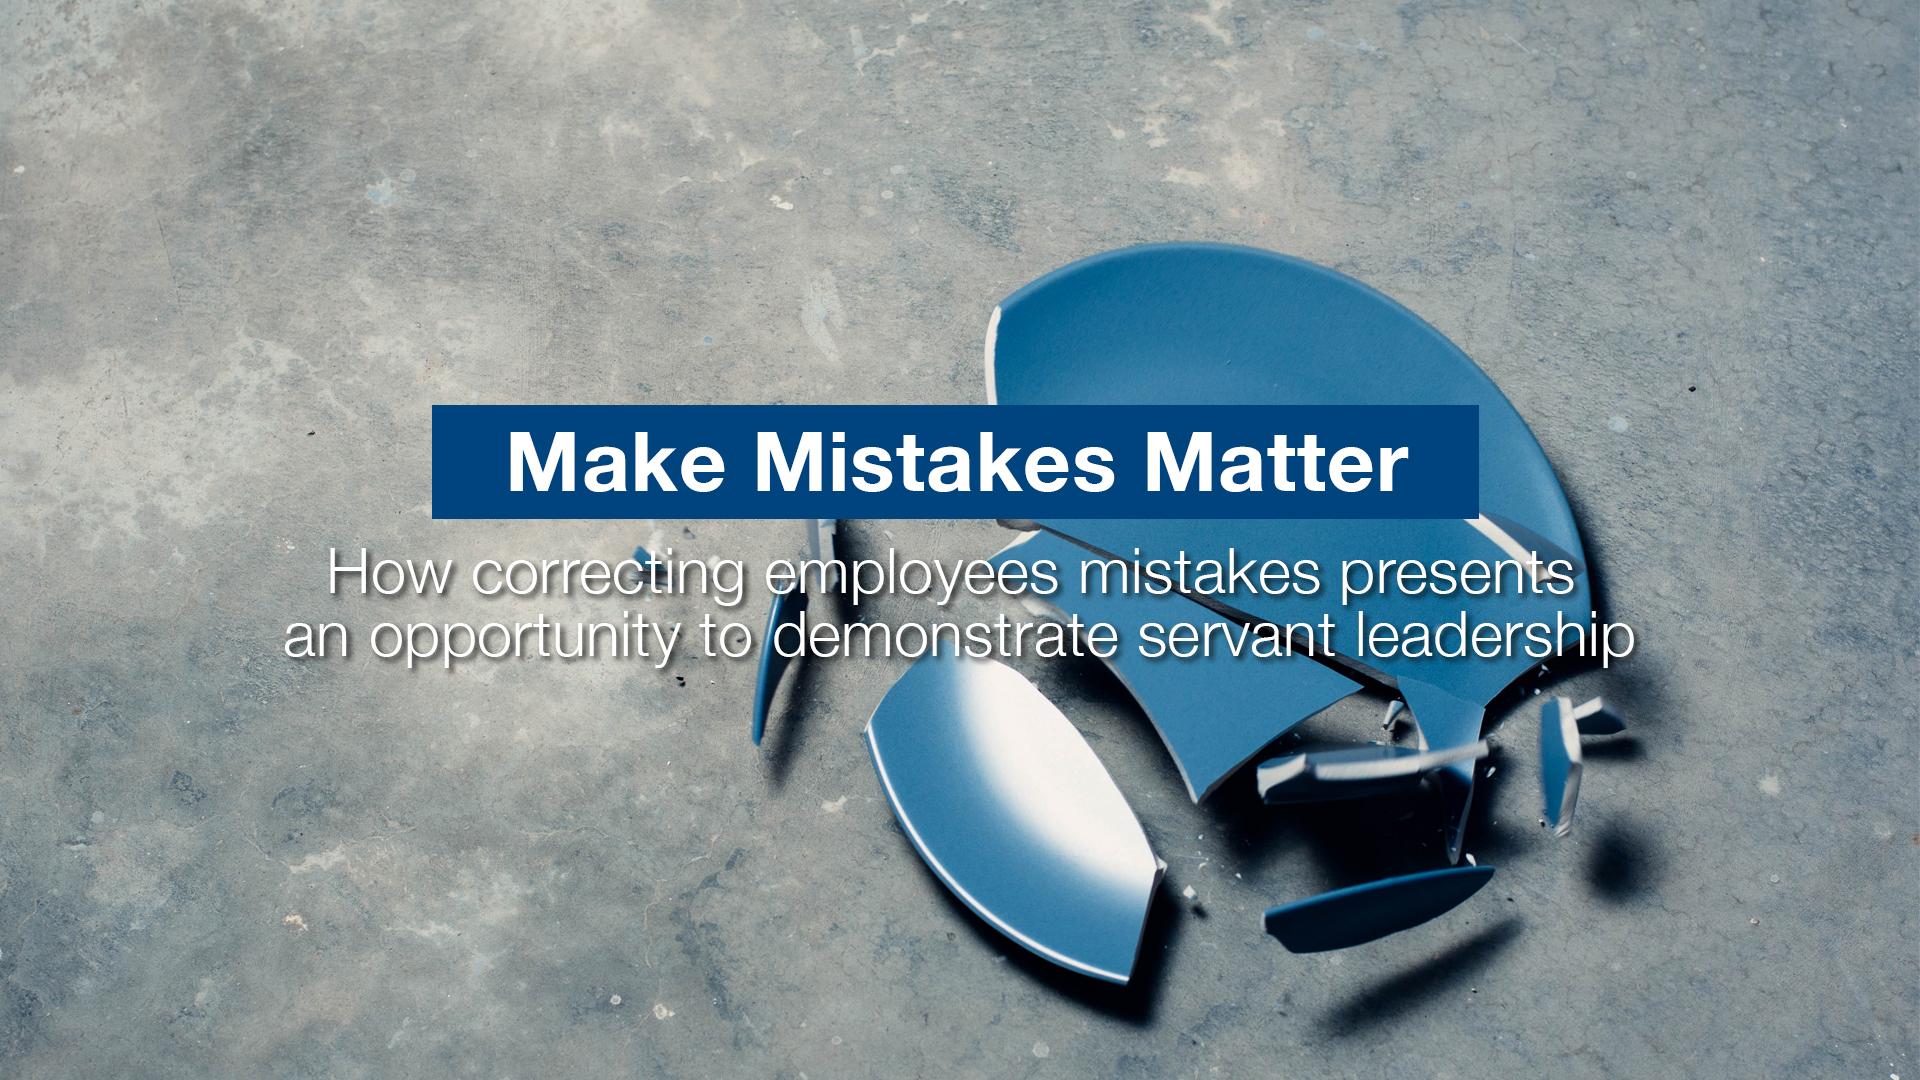 Make Mistakes Matter 1920x1080.jpg